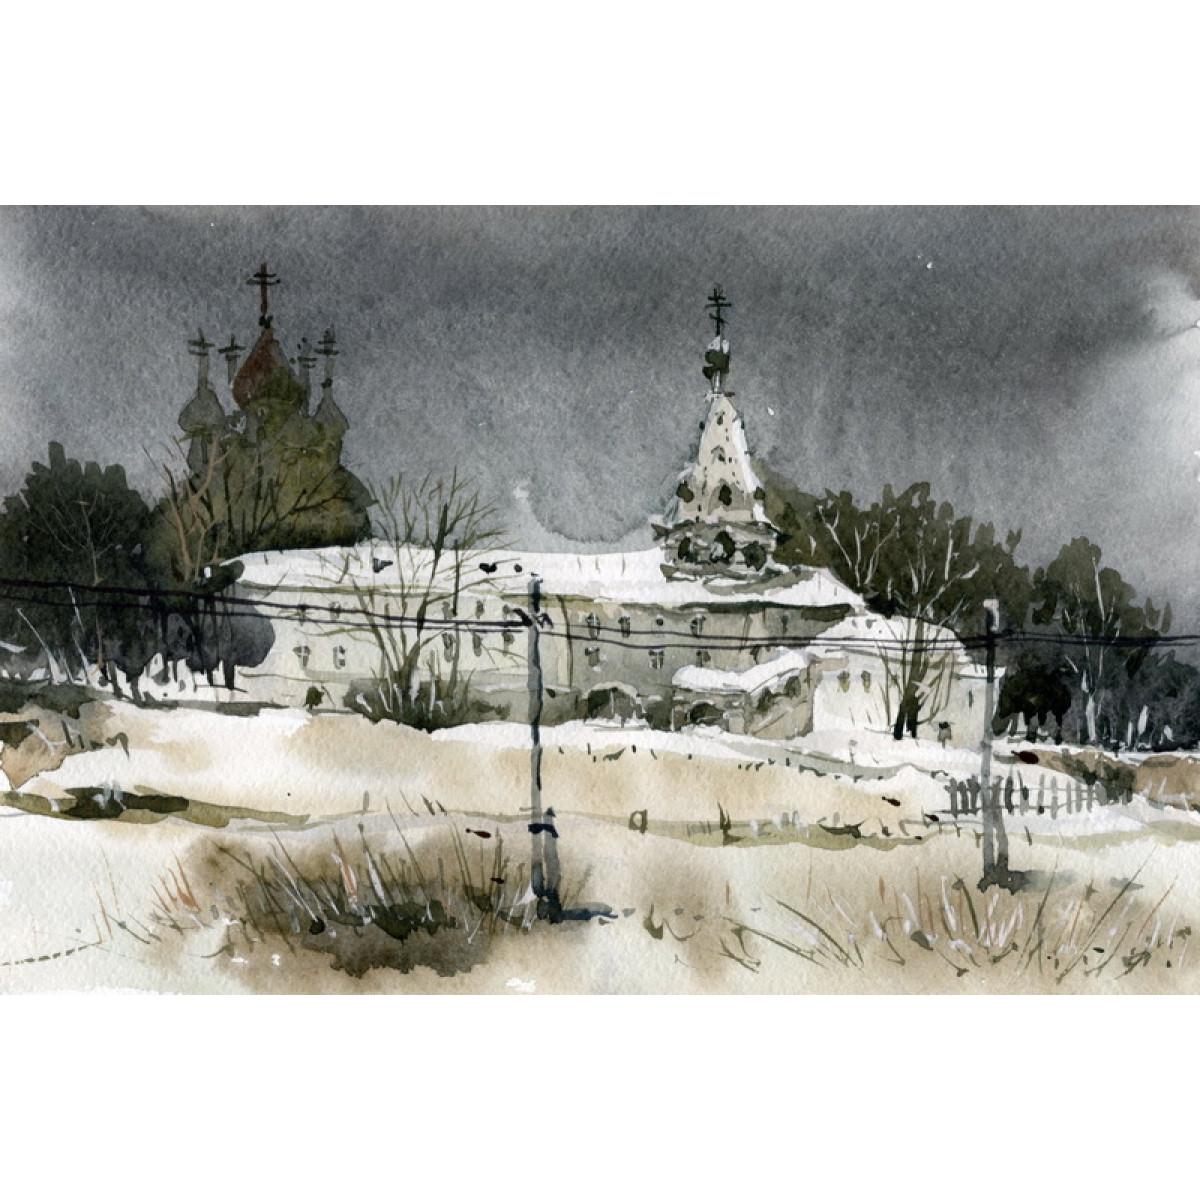 Картина Миниатюра, 9,5х5см, акварель